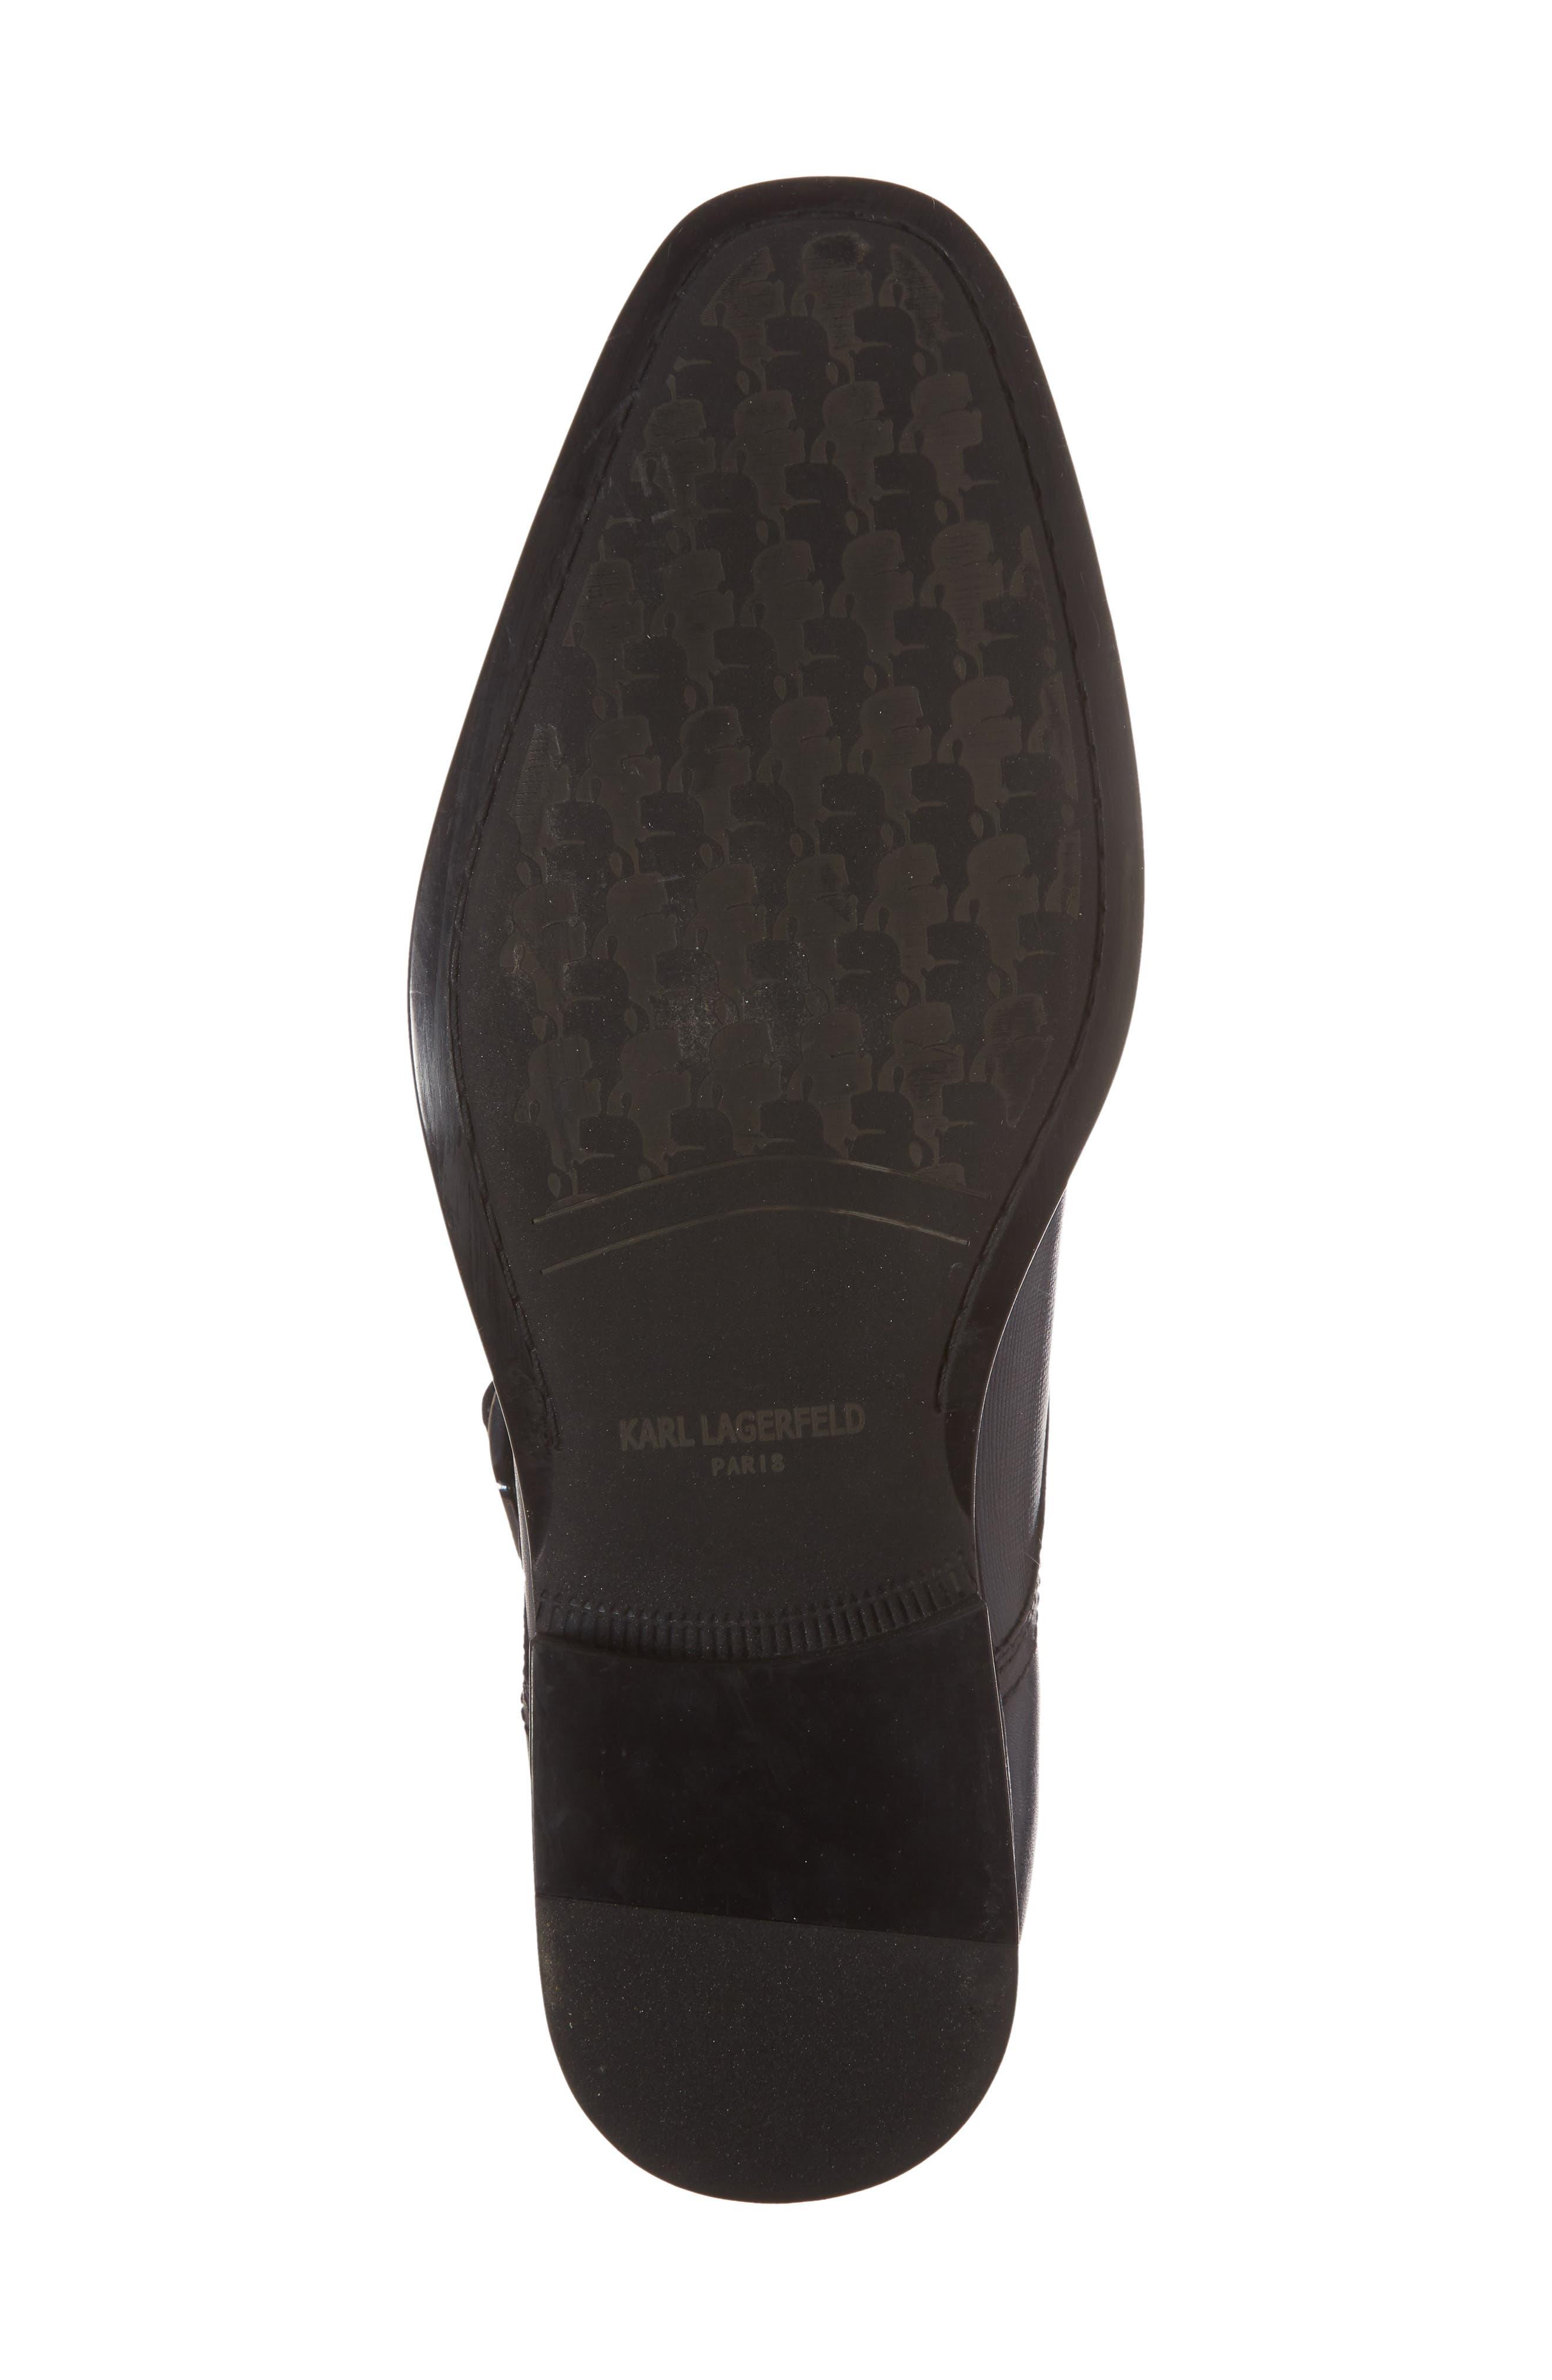 Karl Lagerfeld Double Strap Monk Shoe,                             Alternate thumbnail 6, color,                             Navy